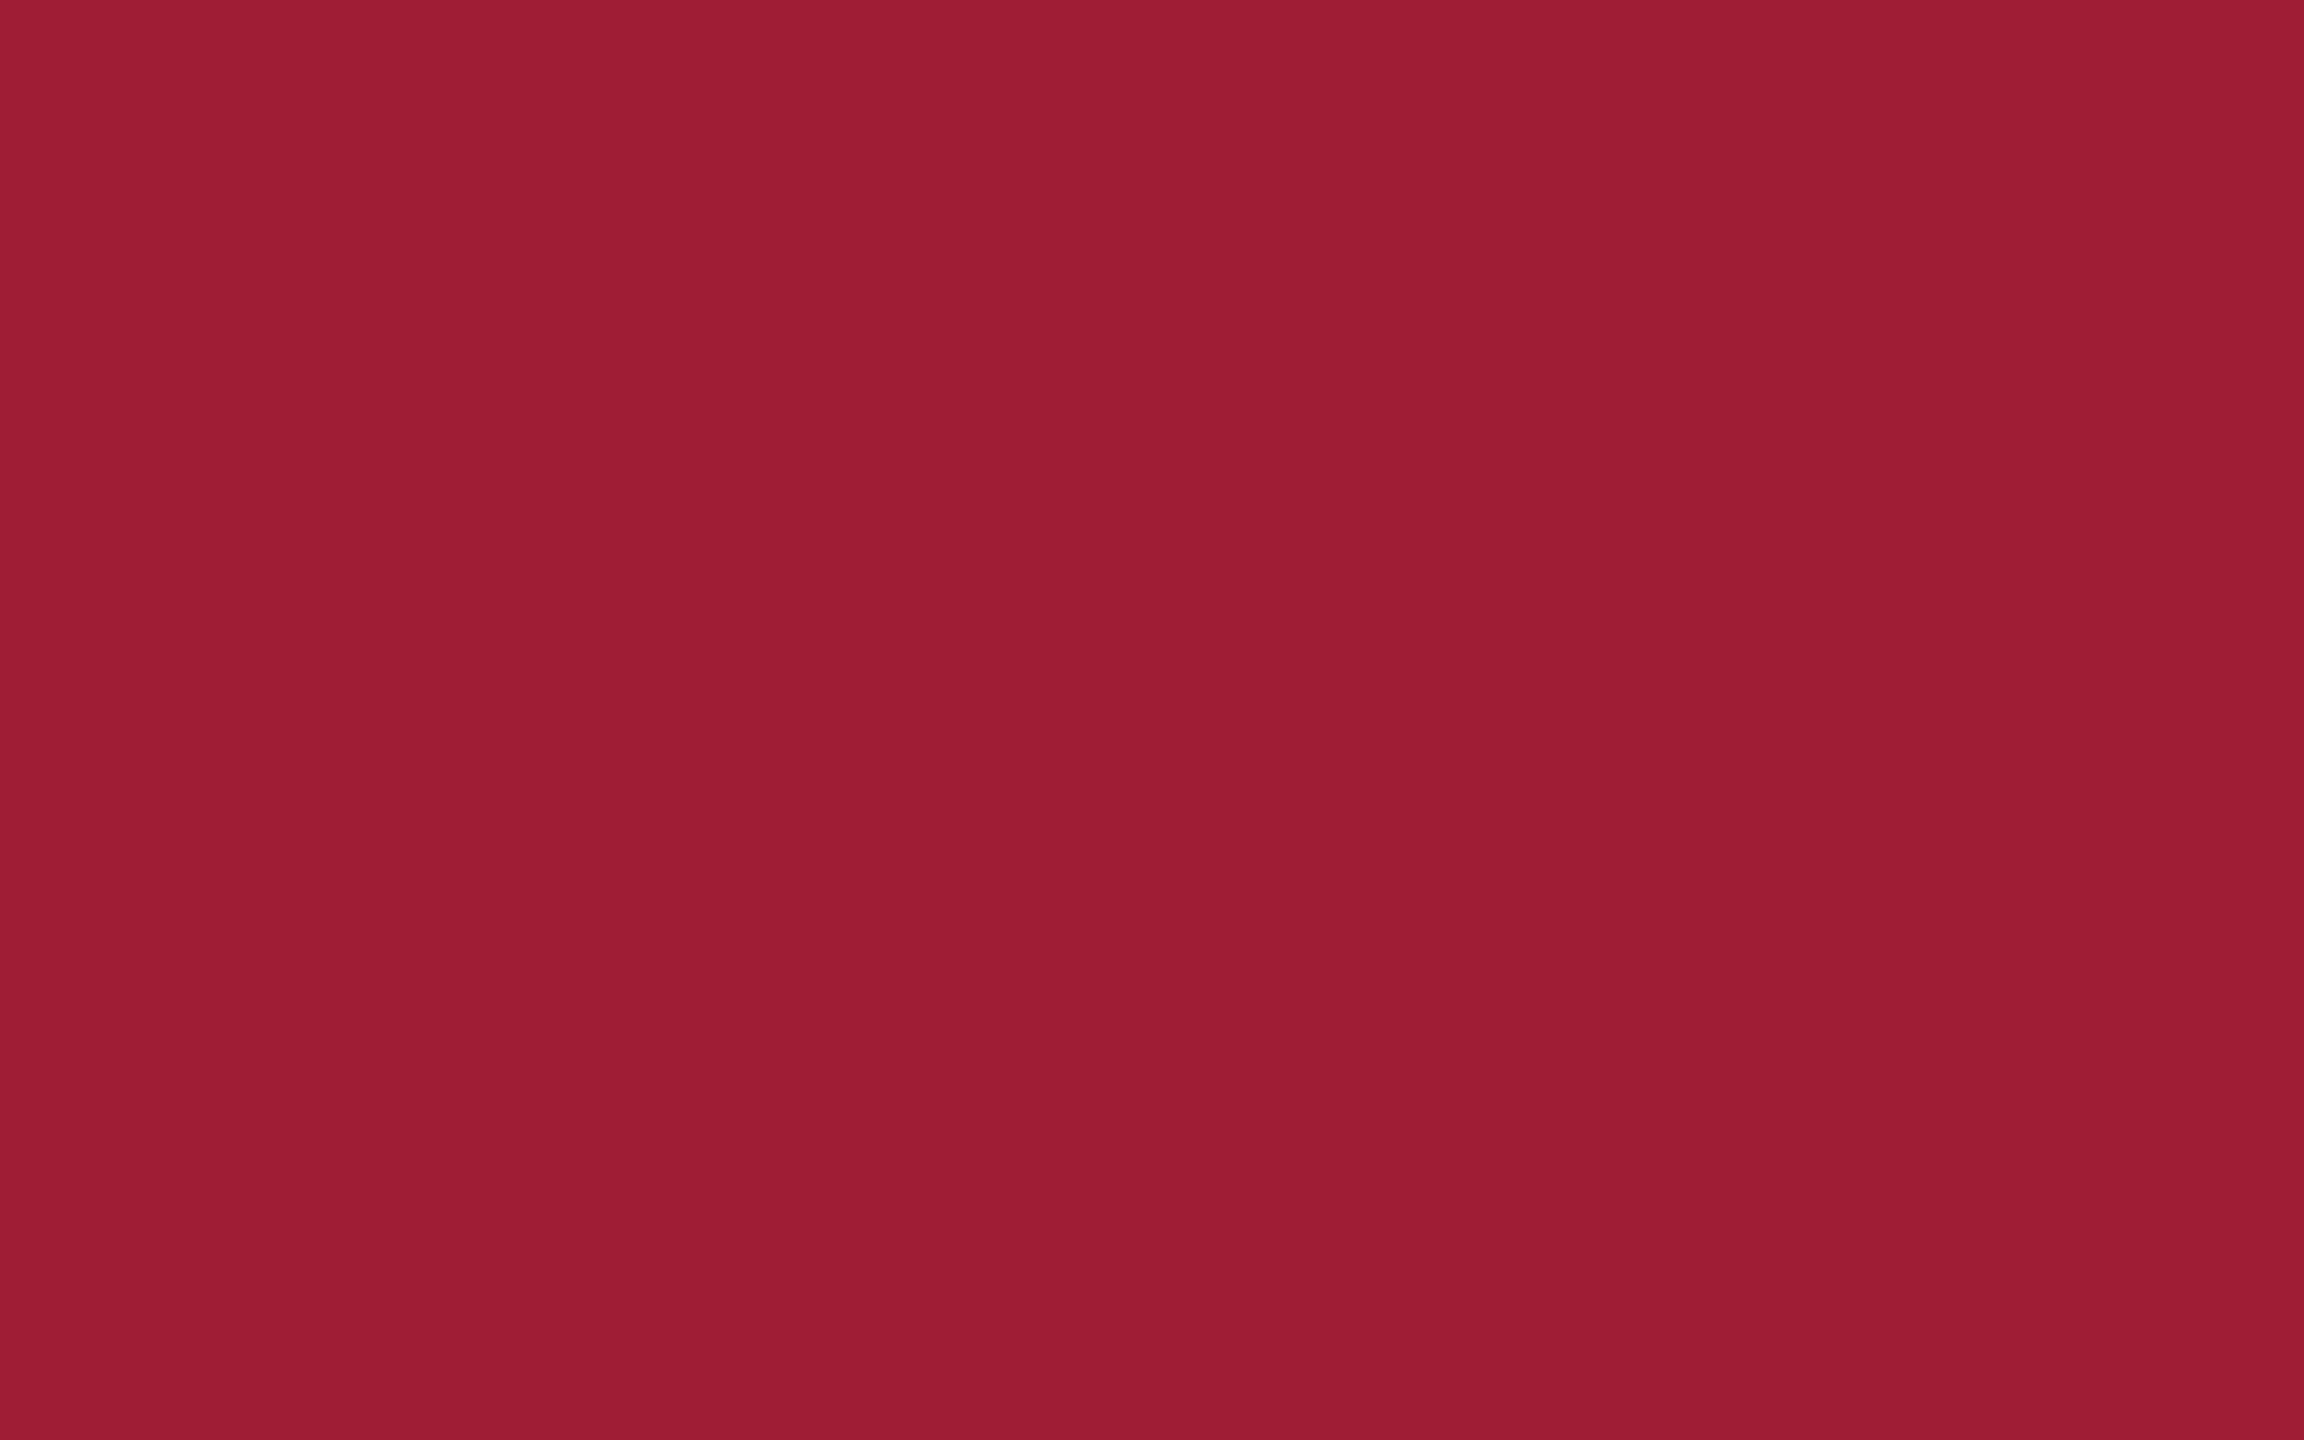 2304x1440 Vivid Burgundy Solid Color Background